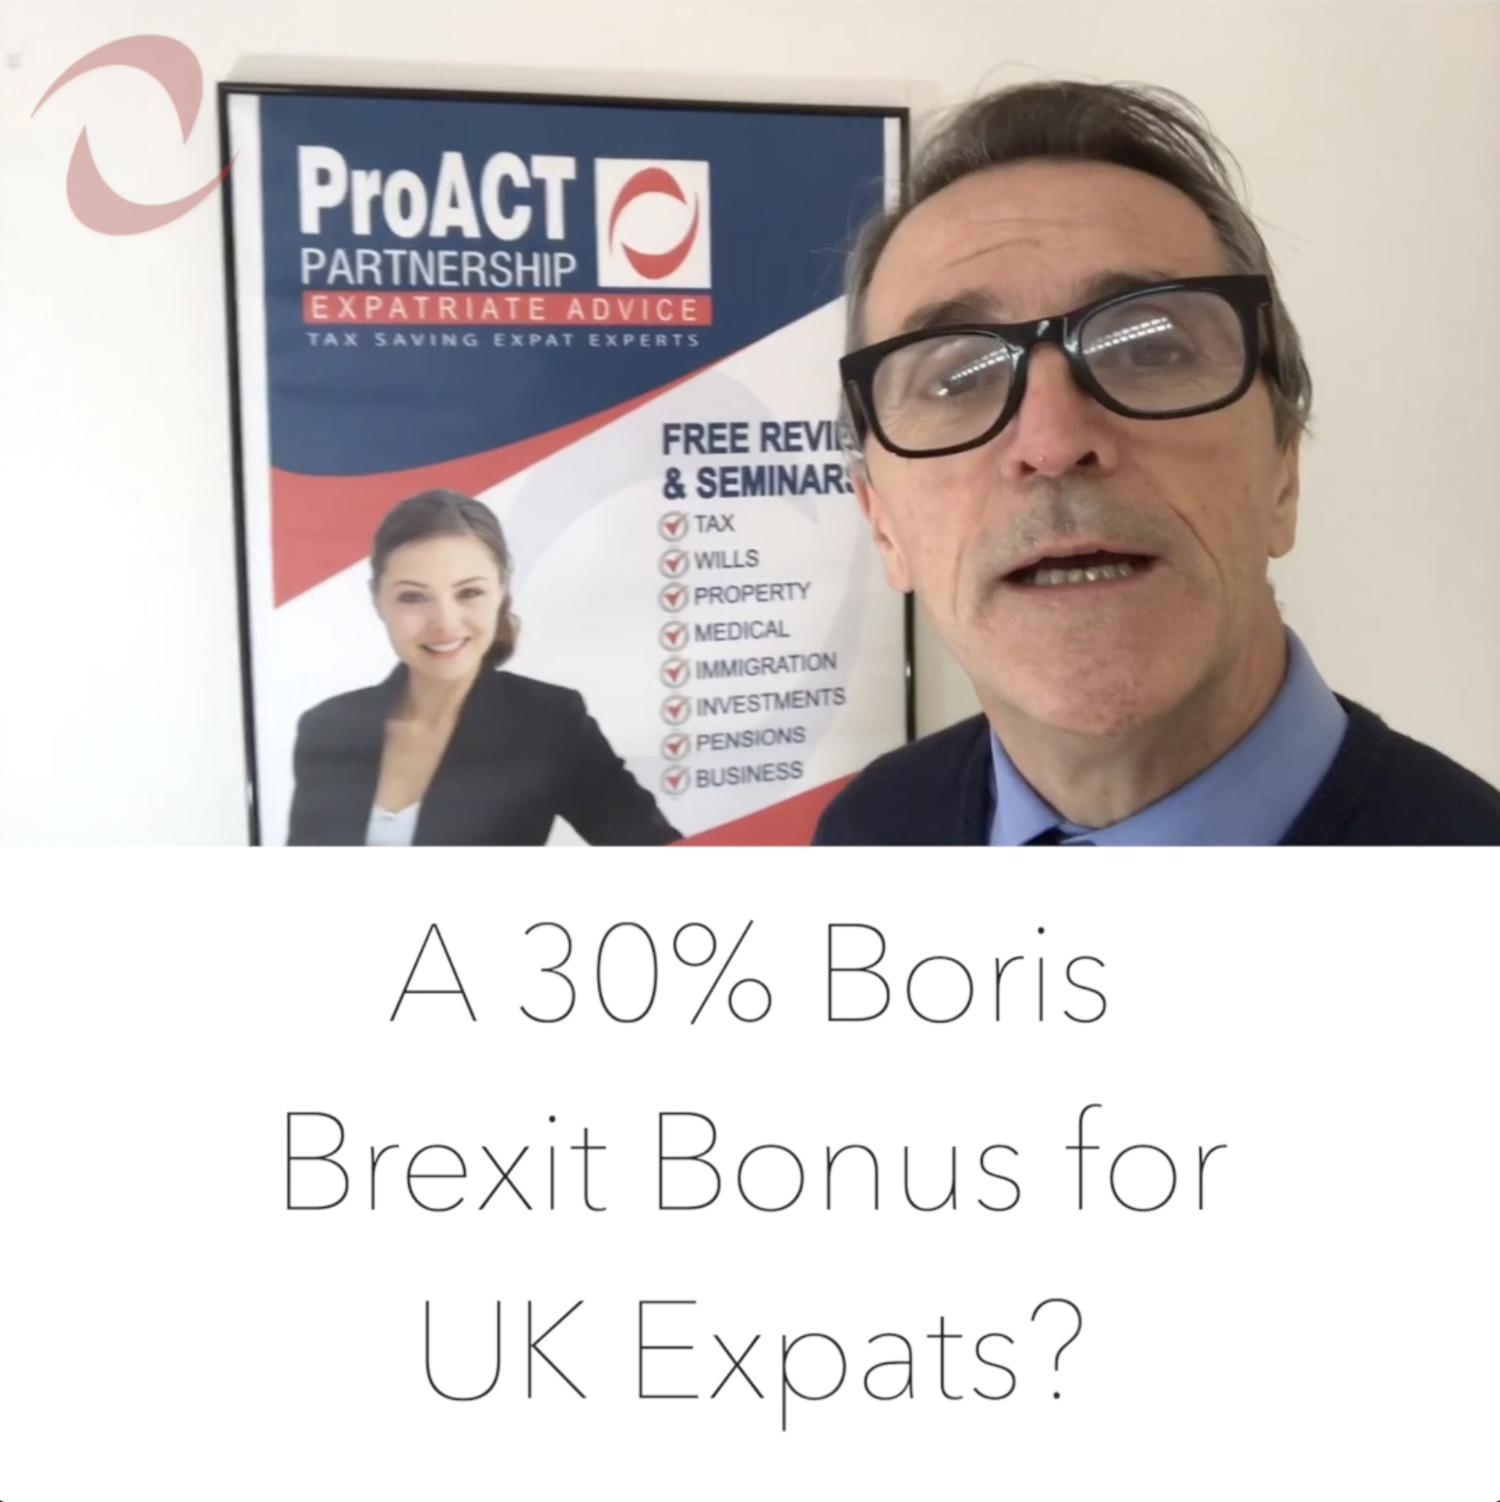 30% Boris Brexit Bonus for UK Expats? - Blog ProACT Partnership